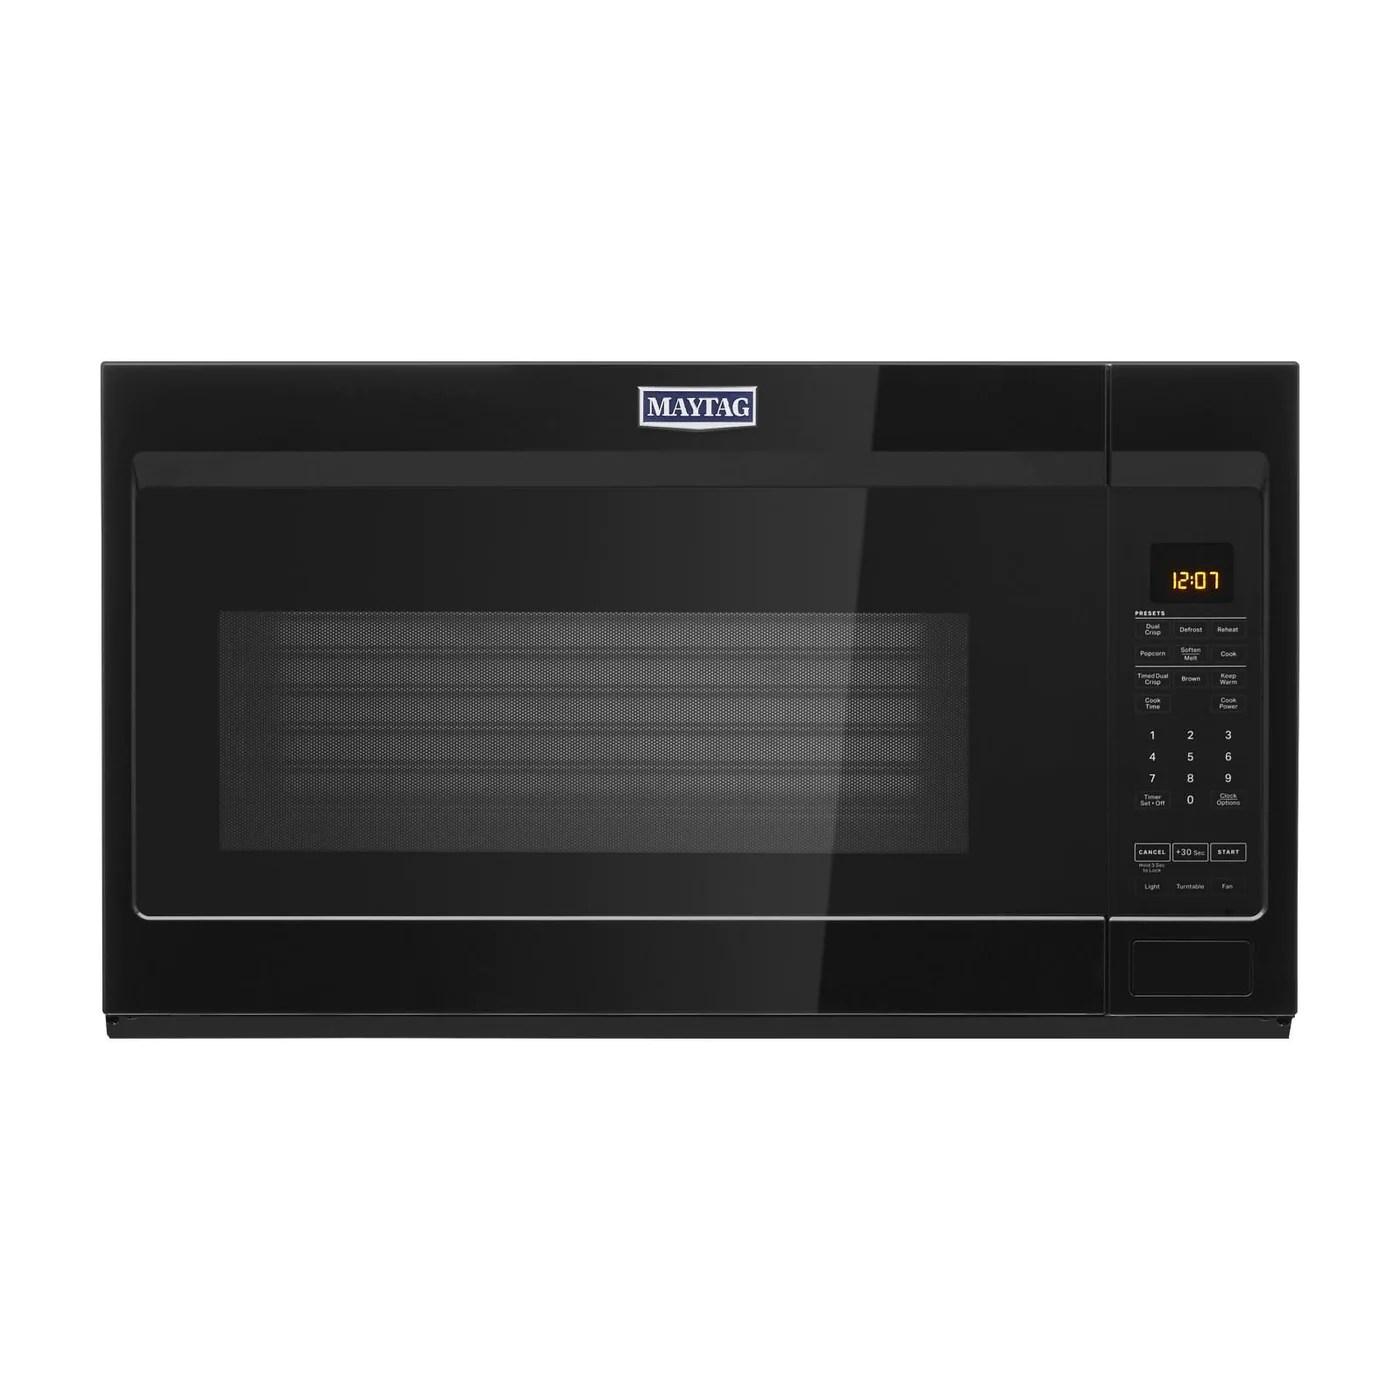 maytag black over the range microwave 1 9 cu ft ymmv4207jb